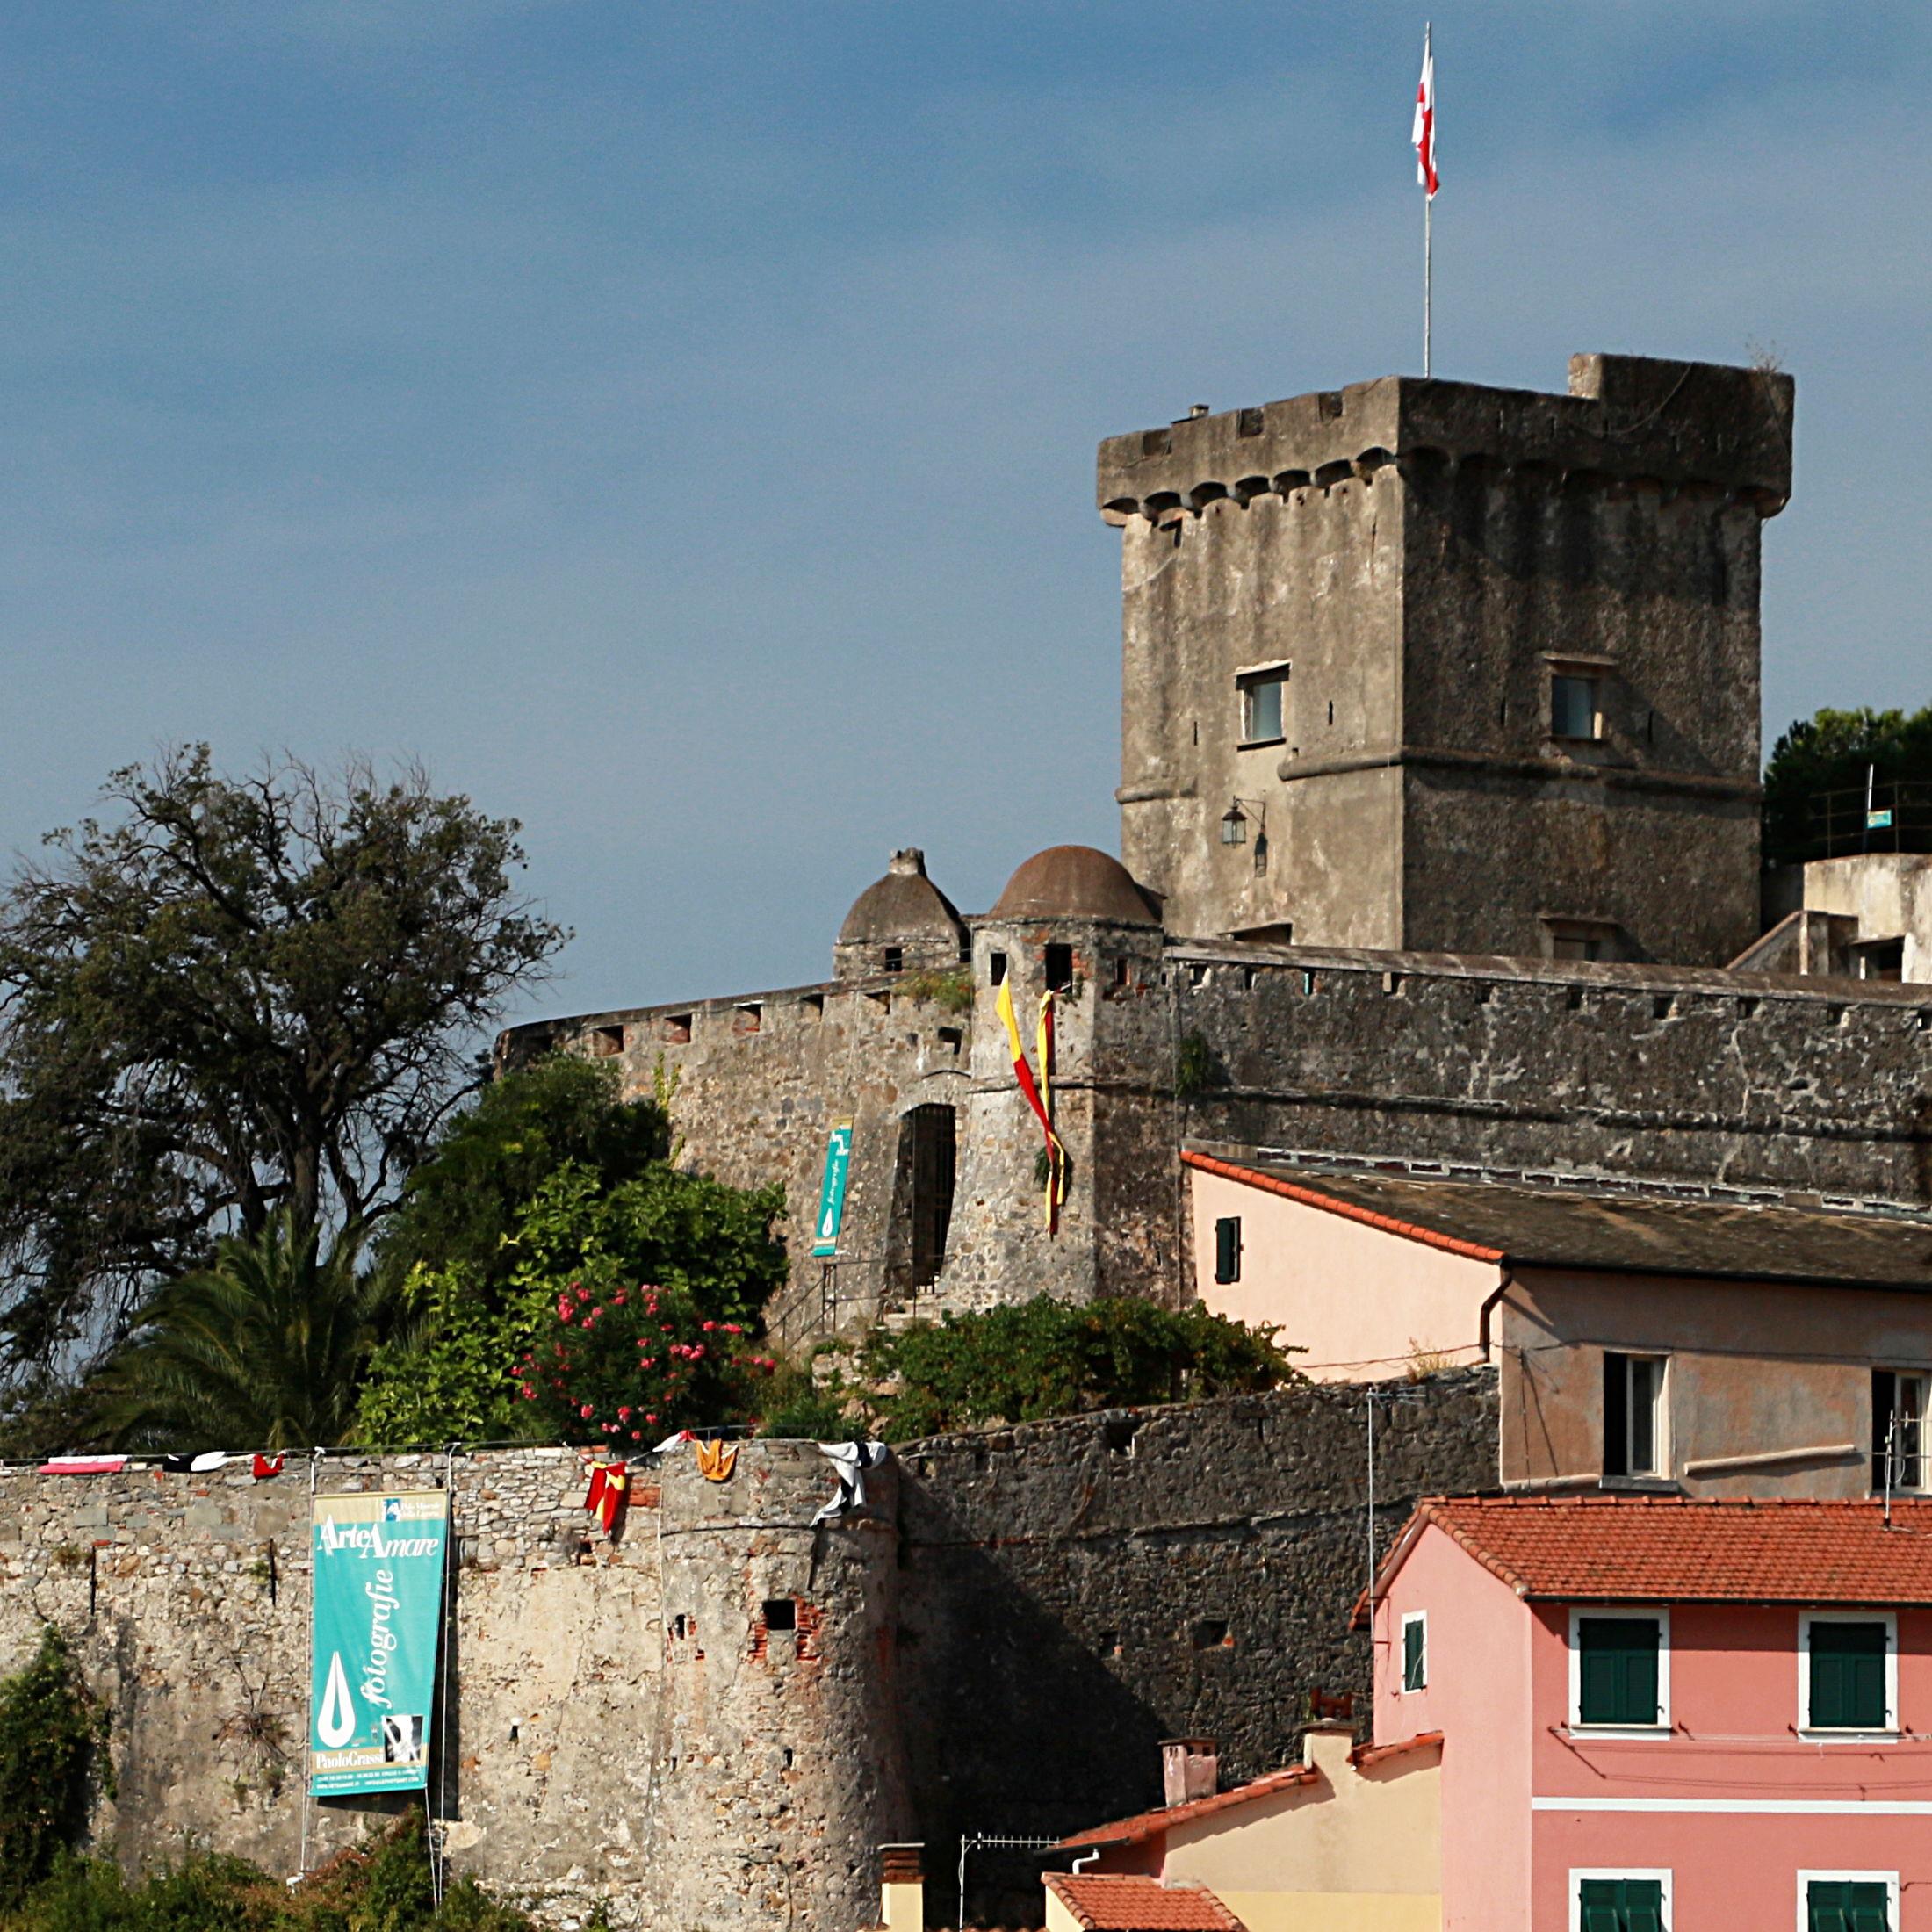 Mostra castello San Terenzo - Lerici. Arte vistuale